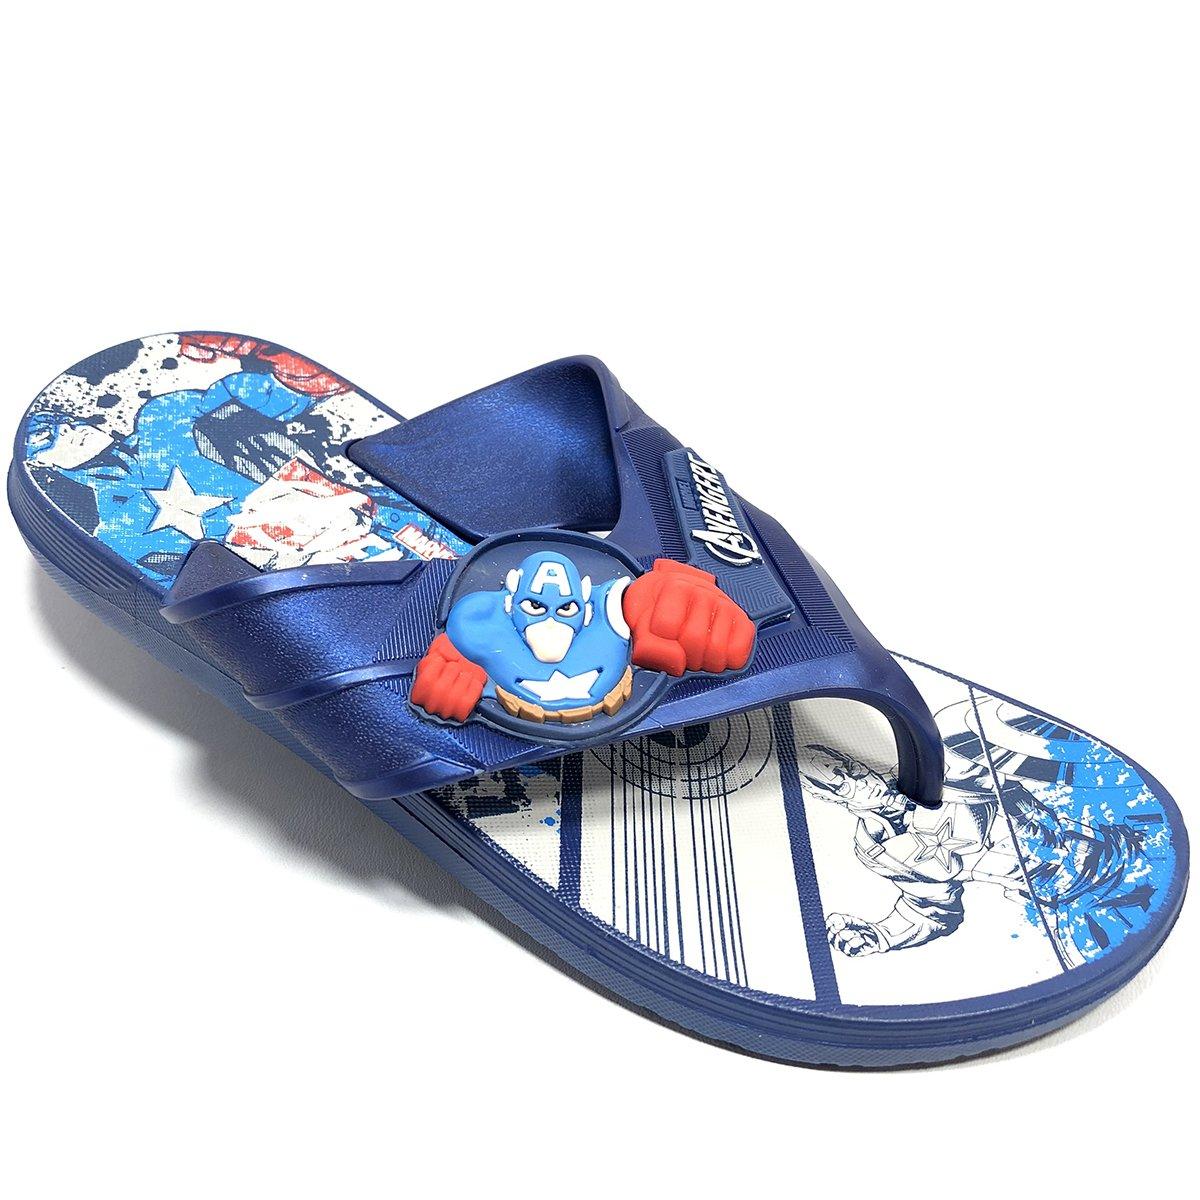 Chinelo Grendene Avengers Super Flop Infantil - Azul